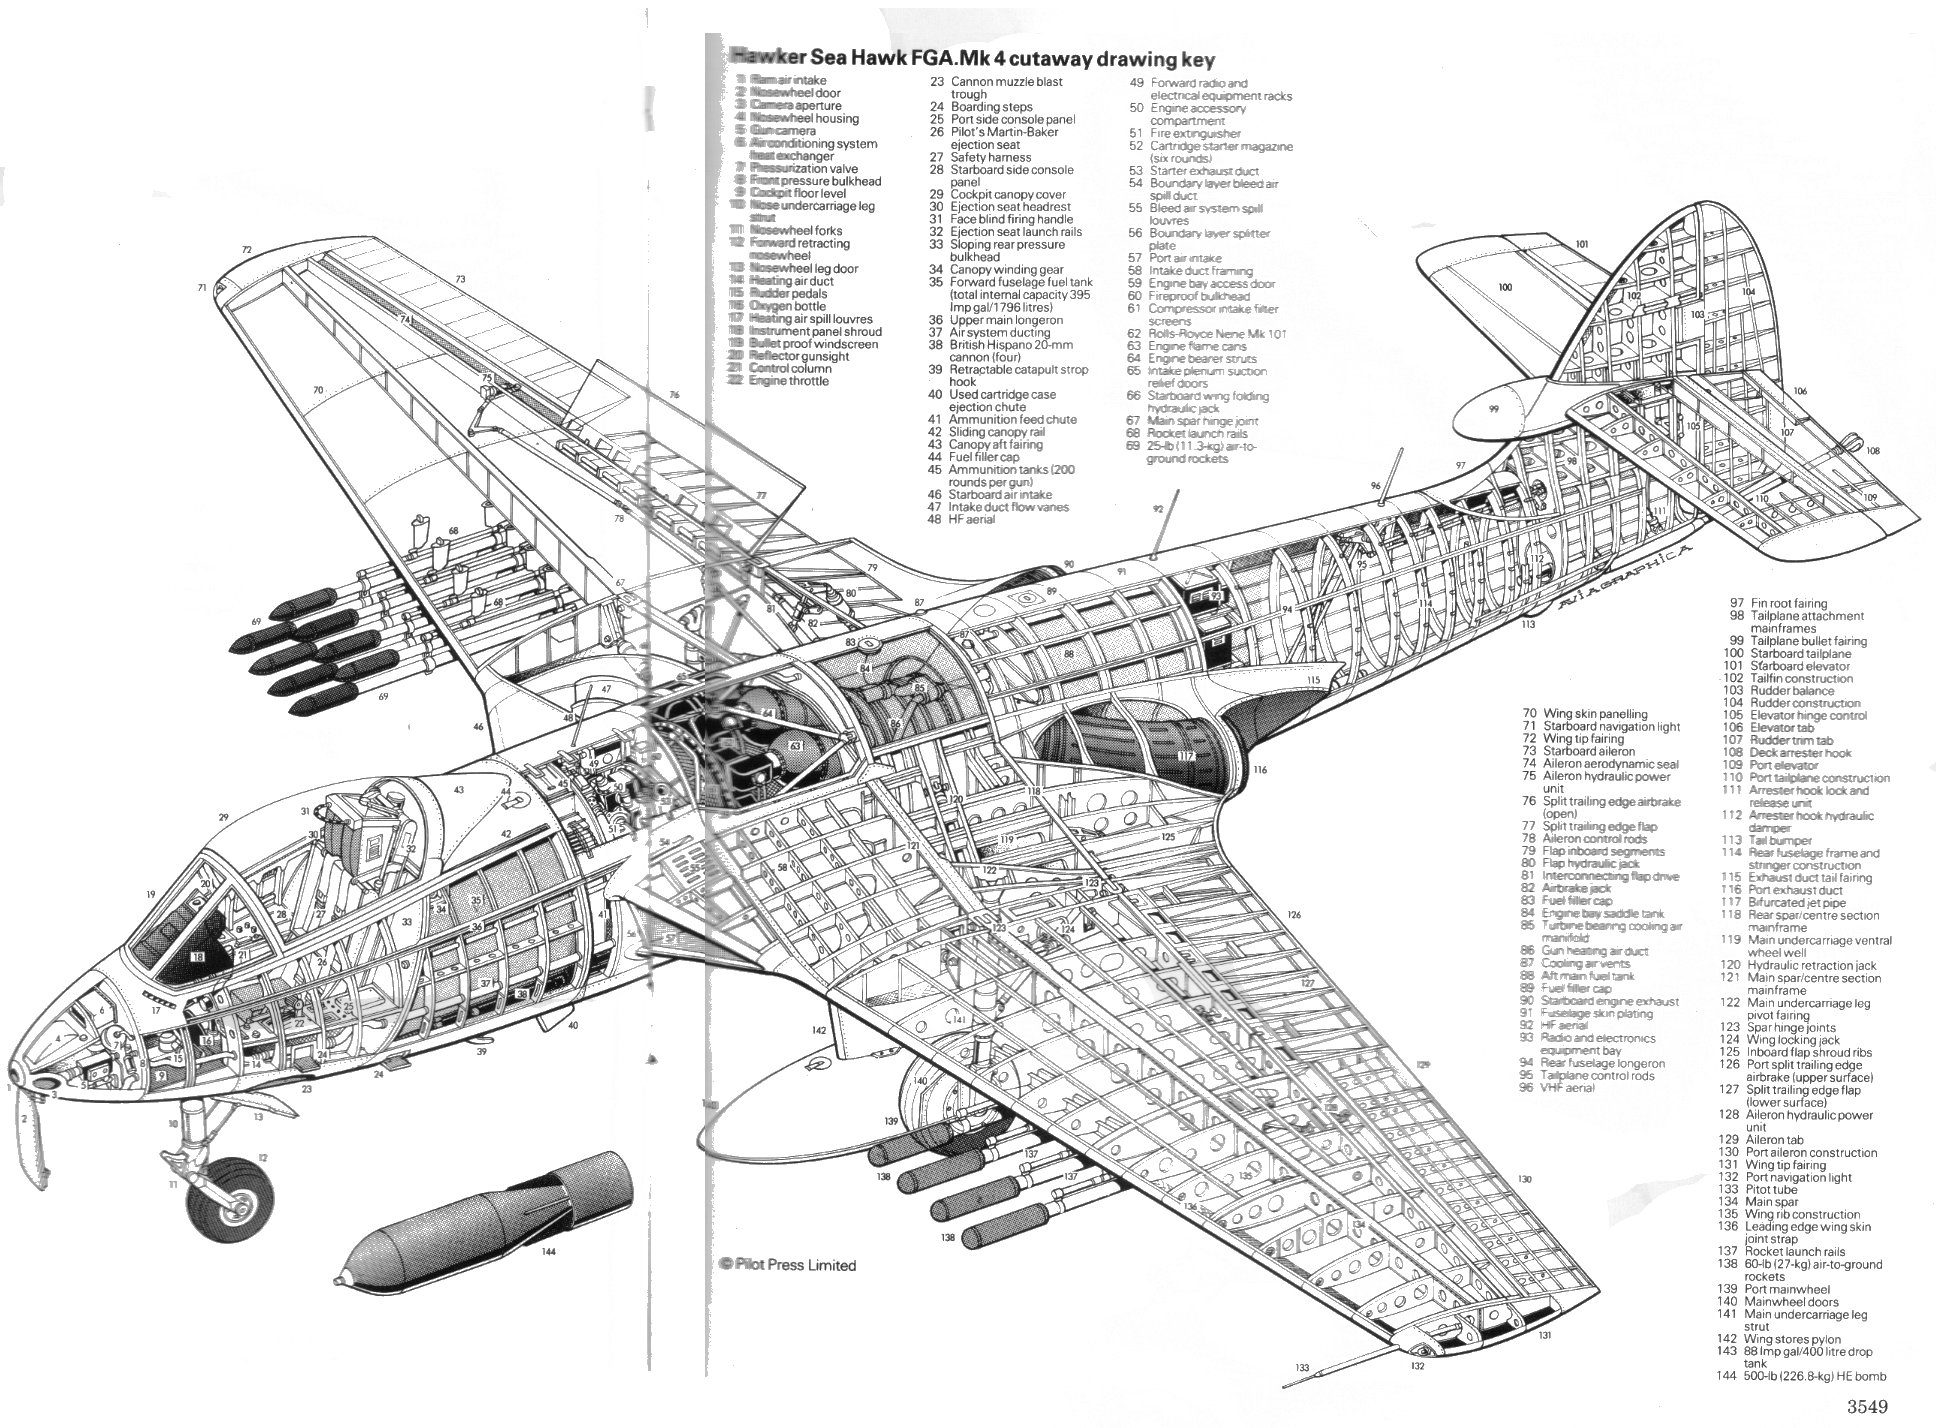 Hawker Sea Hawk Fga4 Cutaway Drawing Key